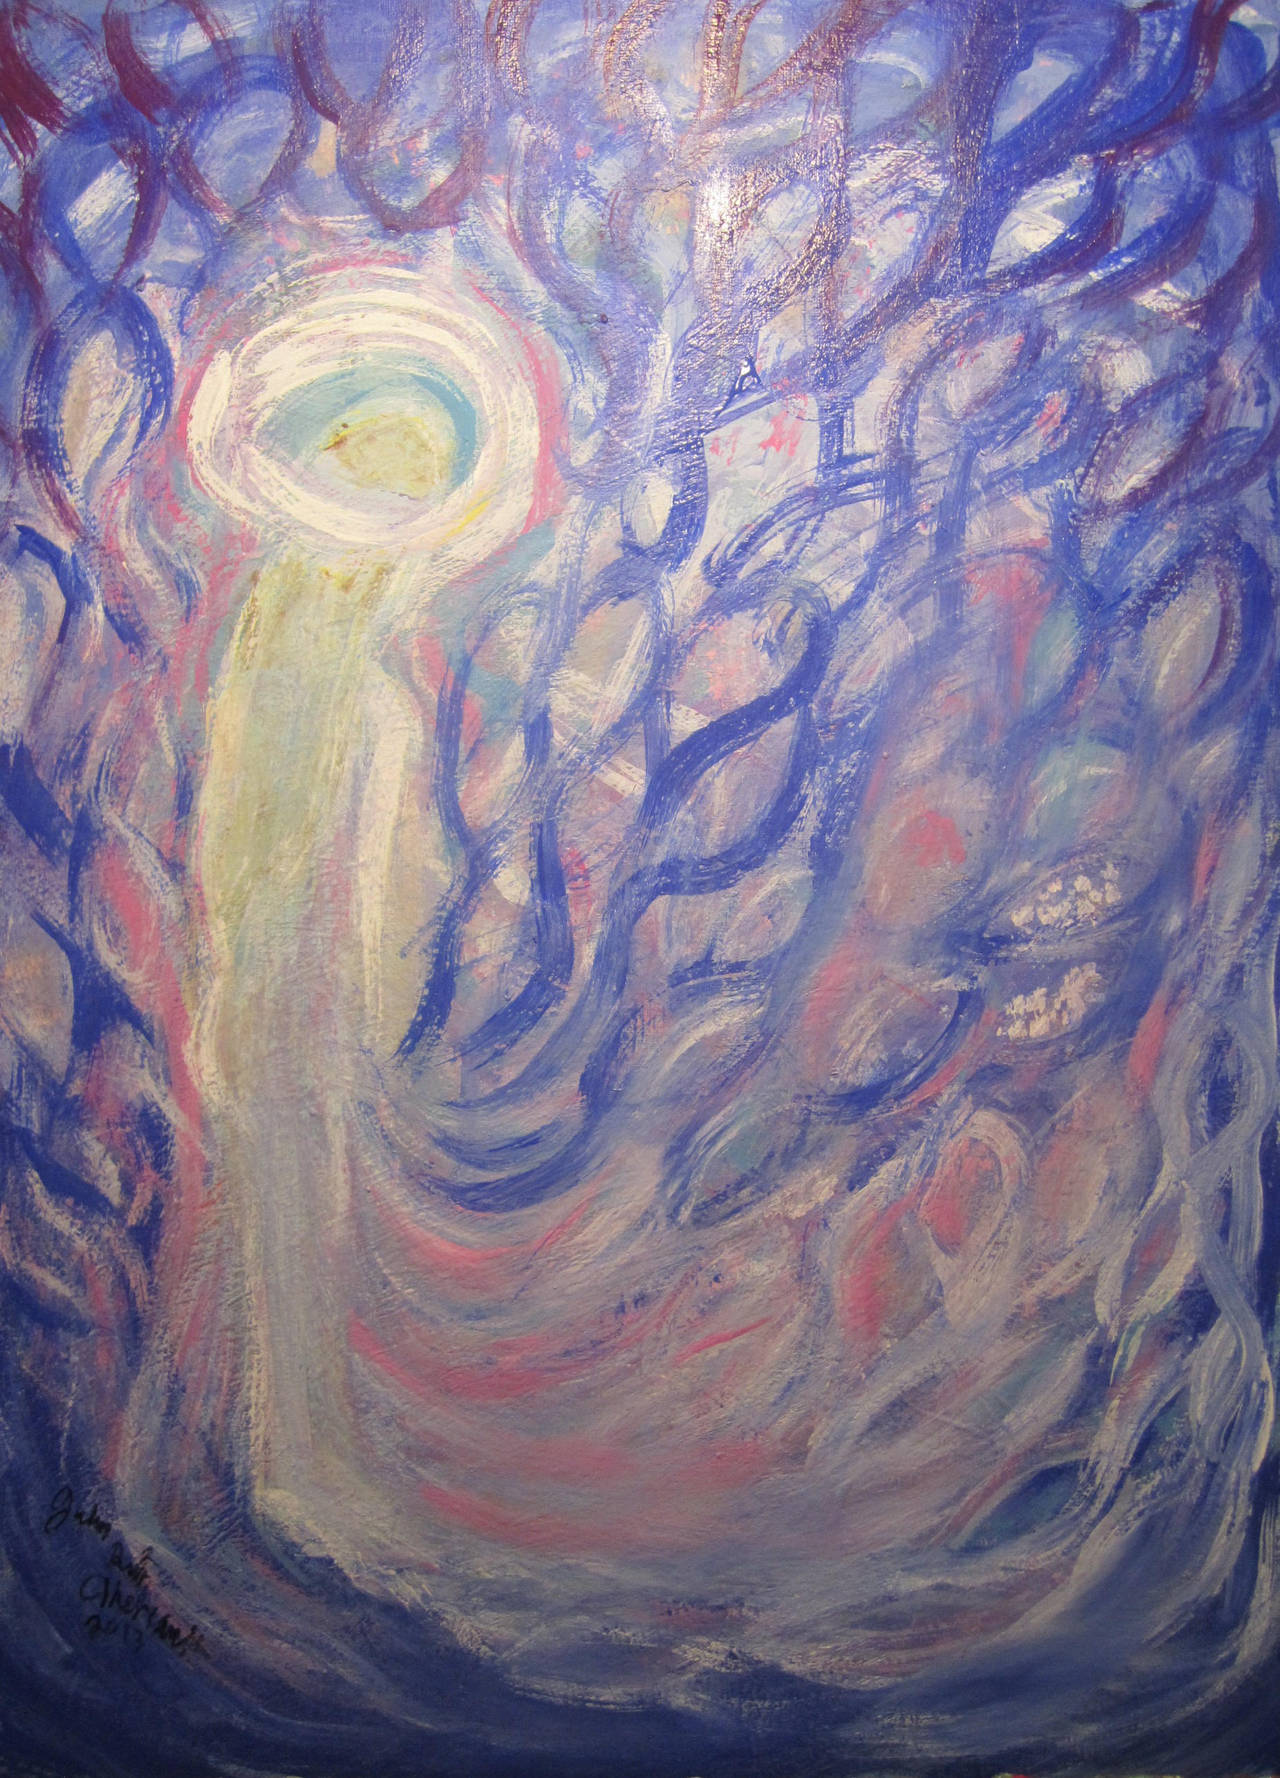 Reflection Of Self by juliarita